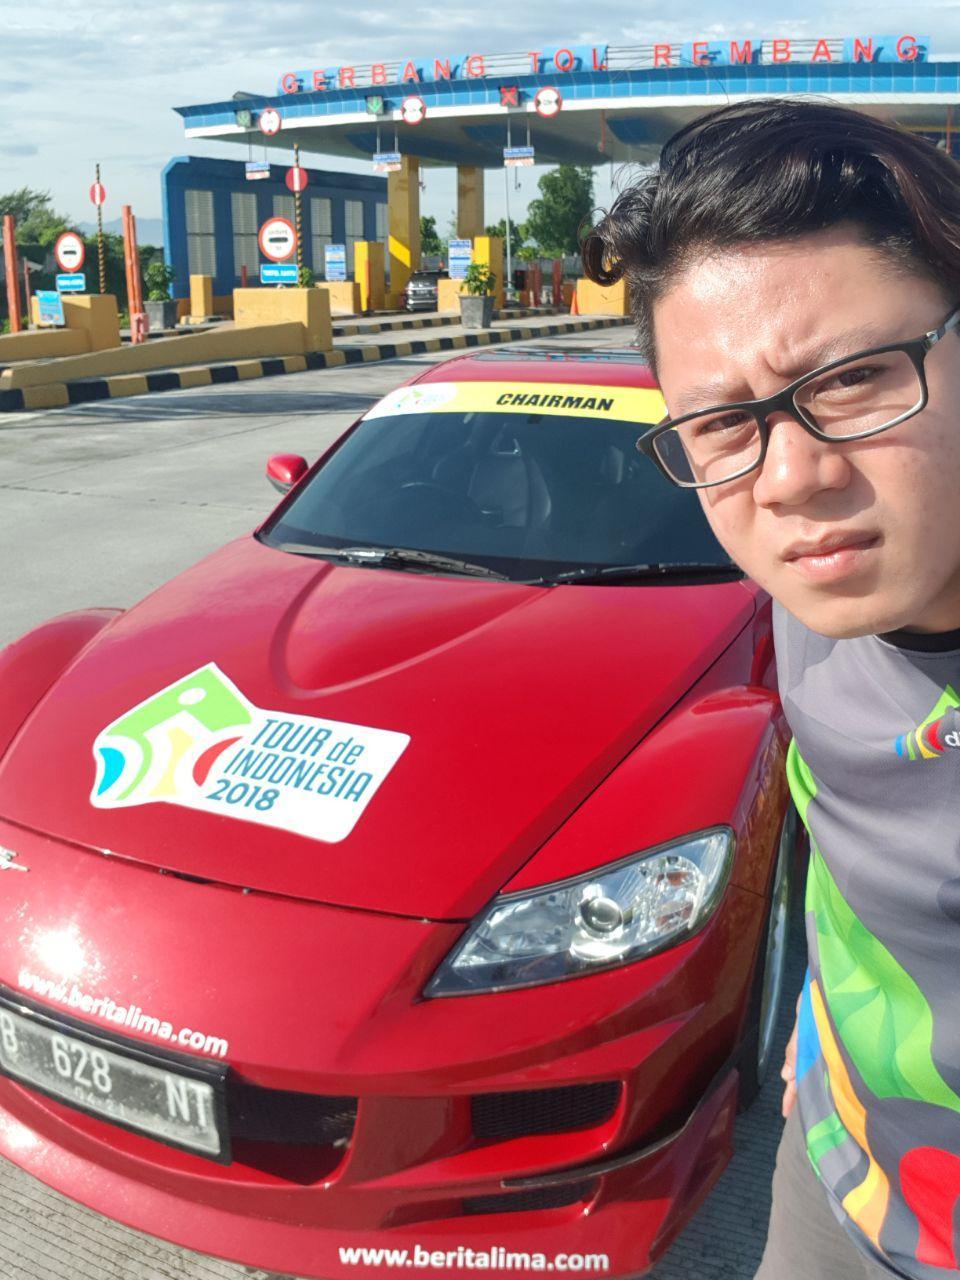 Beritalima Kawal Tour De Indonesia 2018 Tian Putra